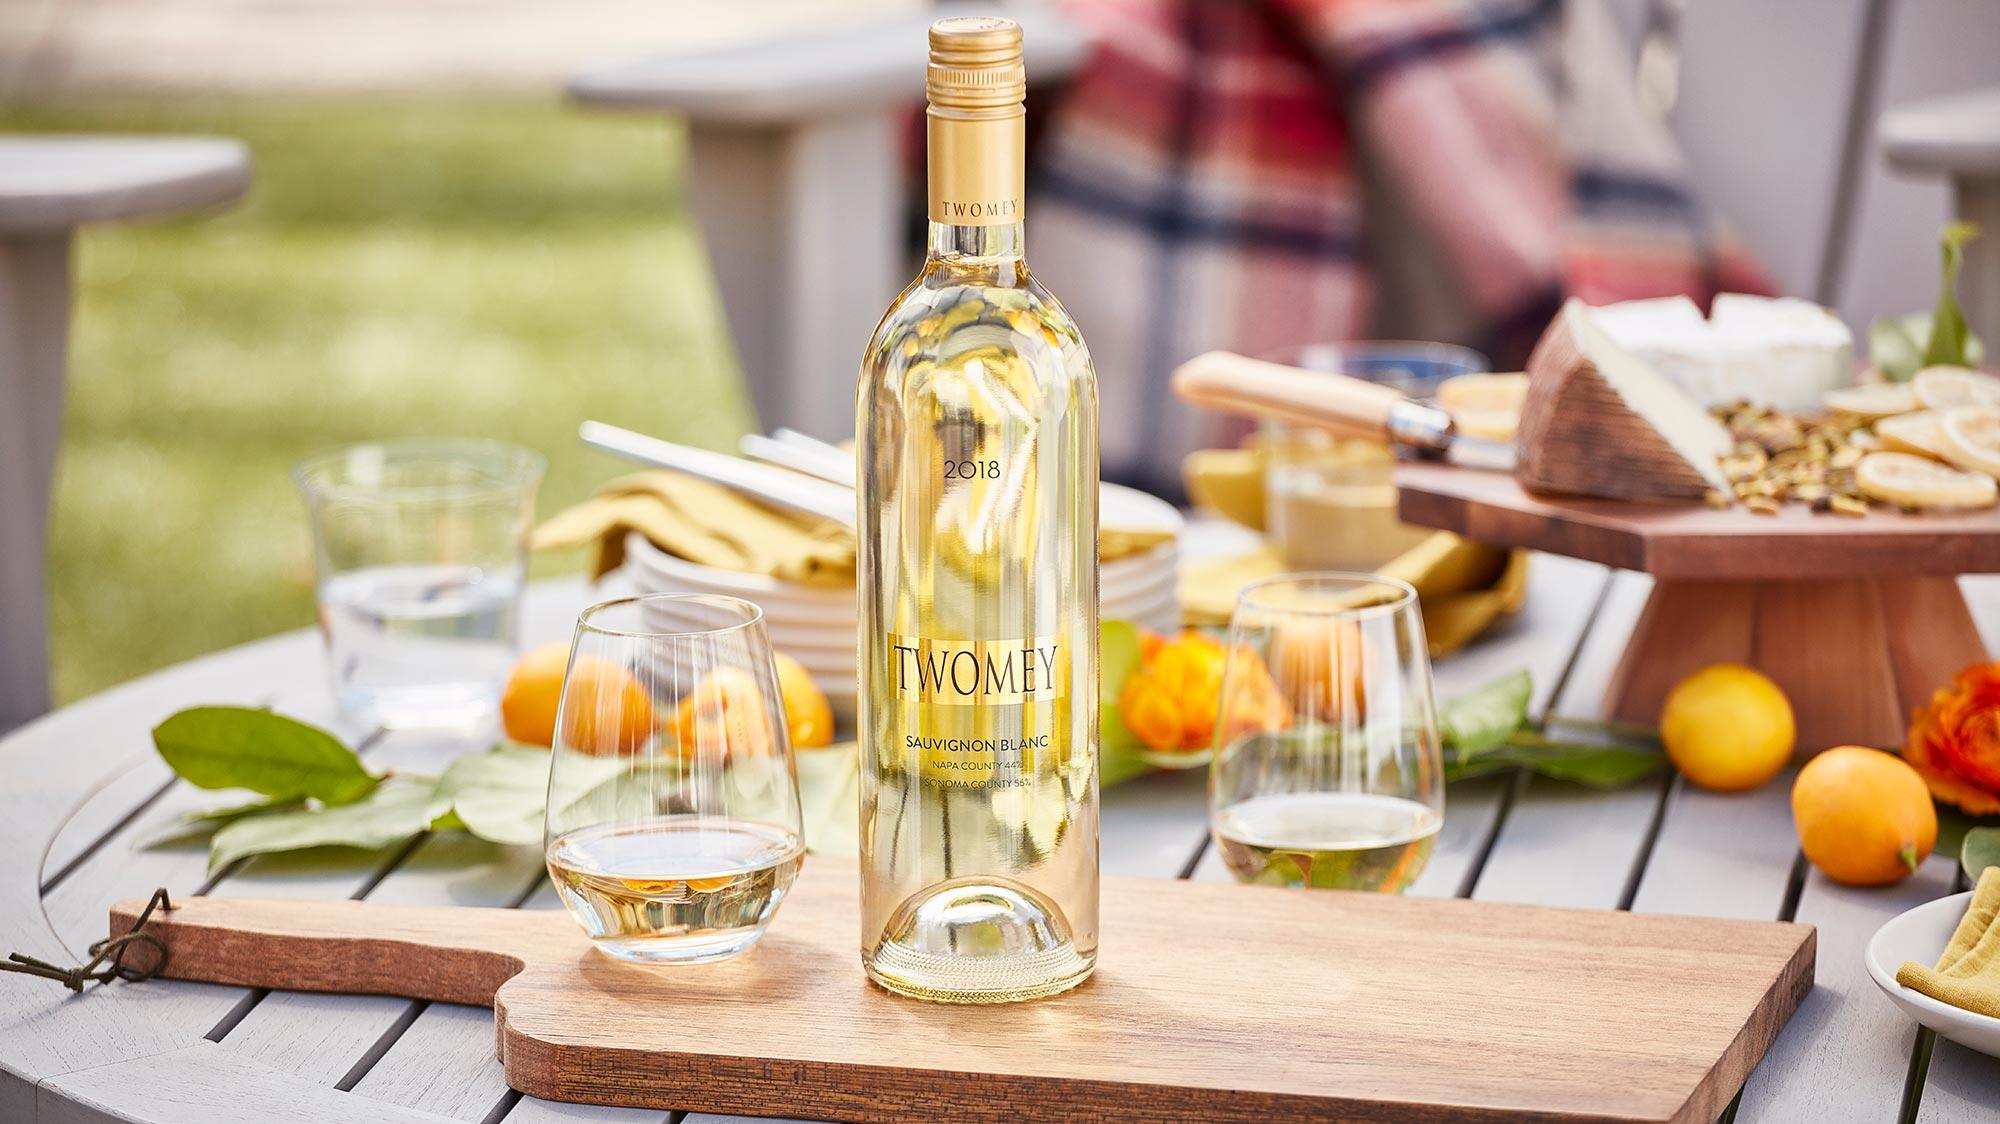 2018 Twomey Sauvignon Blanc